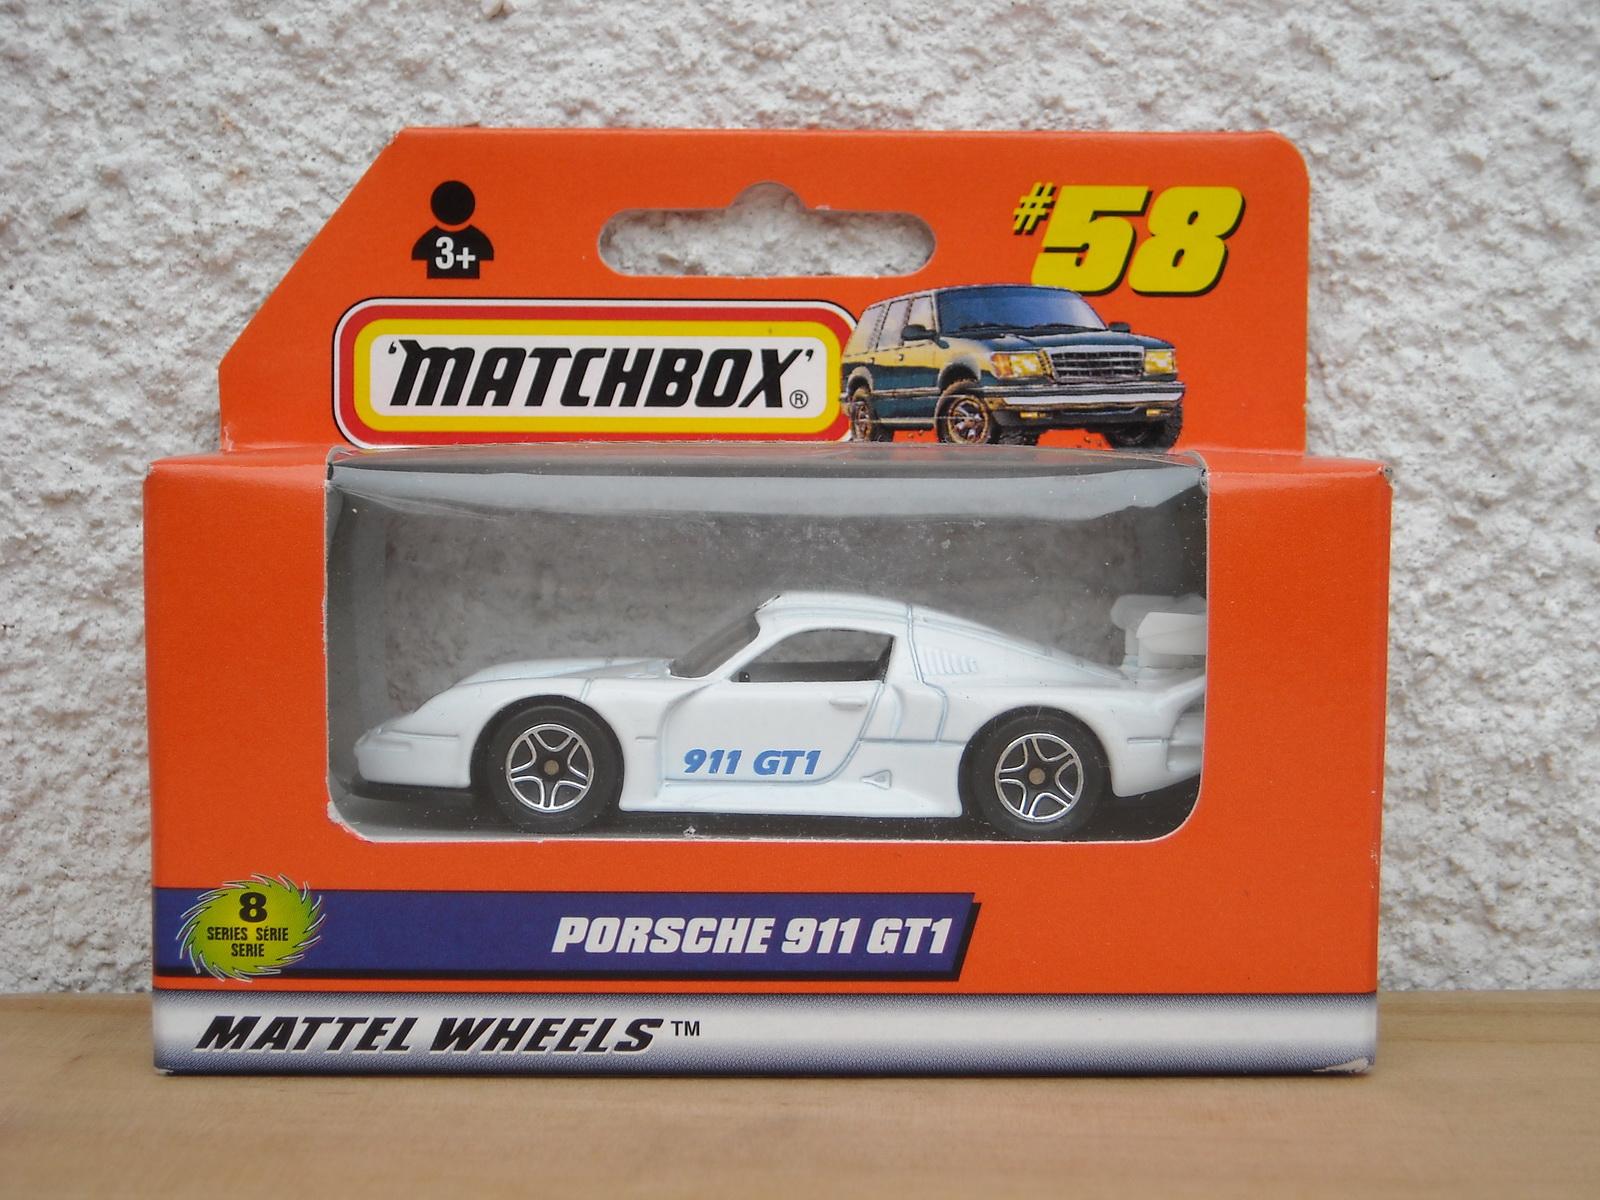 matchbox memories matchbox mb 58 porsche 911 gt1. Black Bedroom Furniture Sets. Home Design Ideas